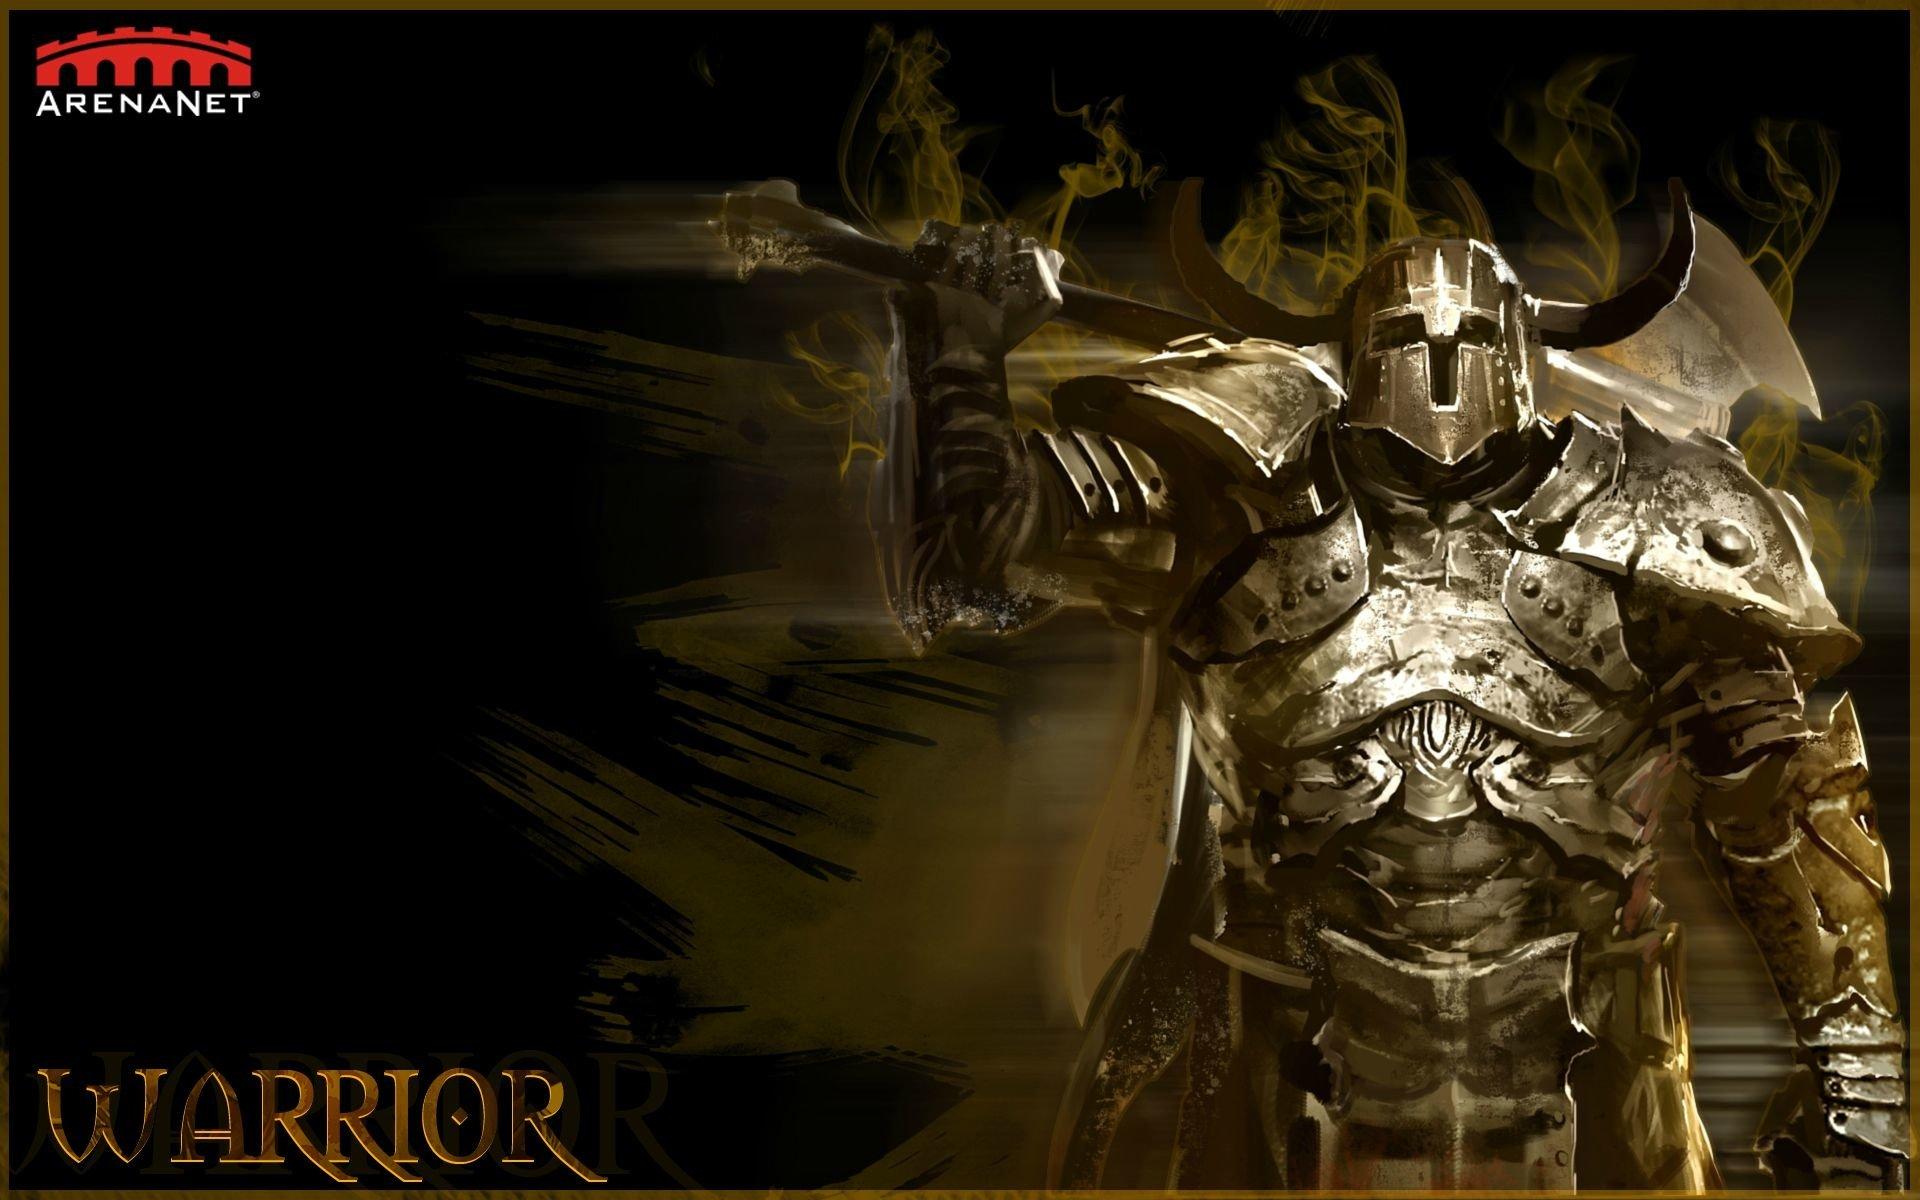 Guild Wars 2 Hd Wallpaper Background Image 1920x1200 Id